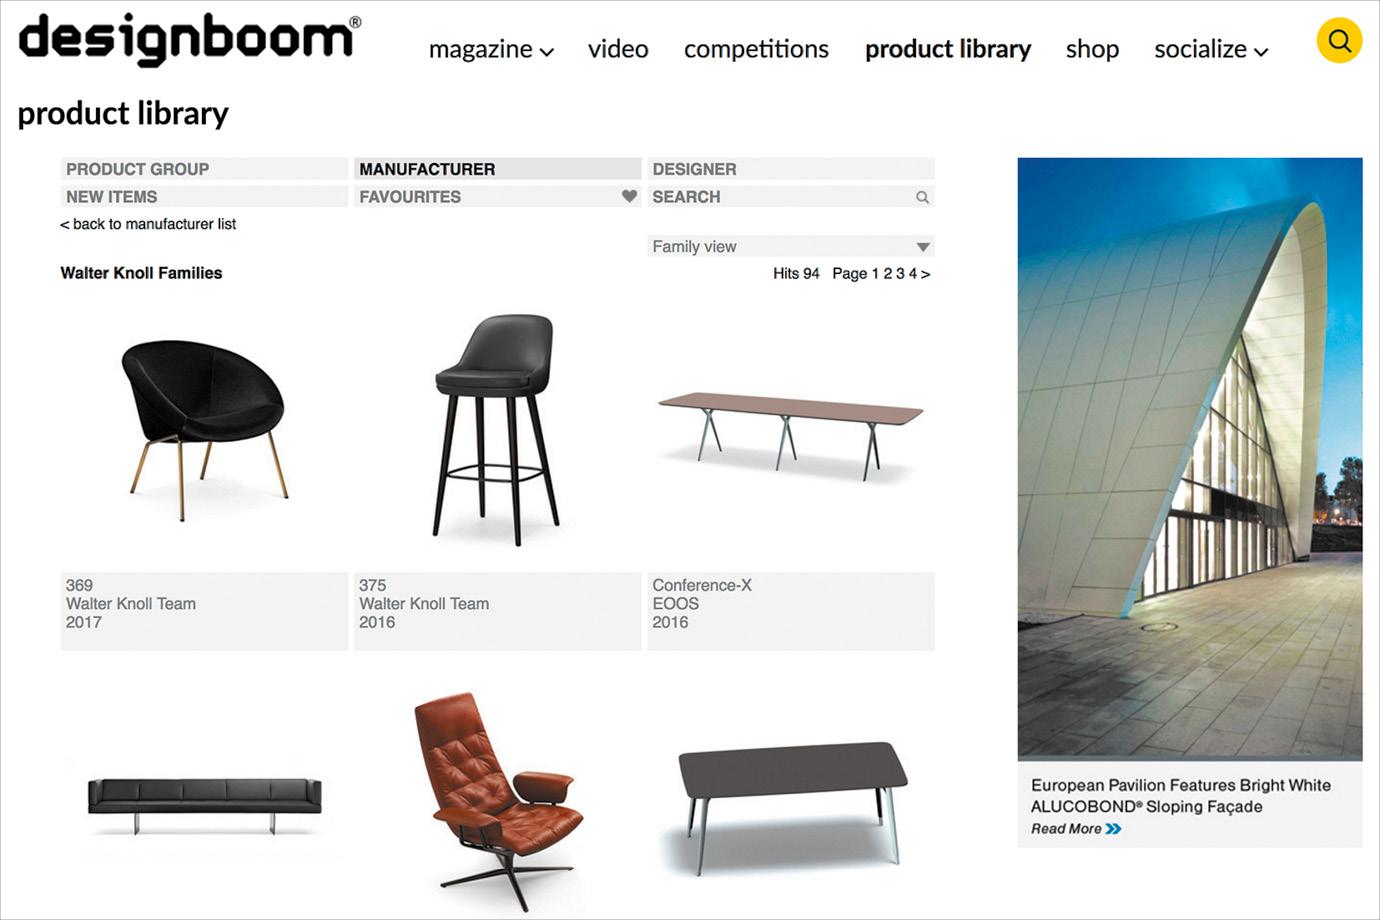 designboom_product-library.jpg